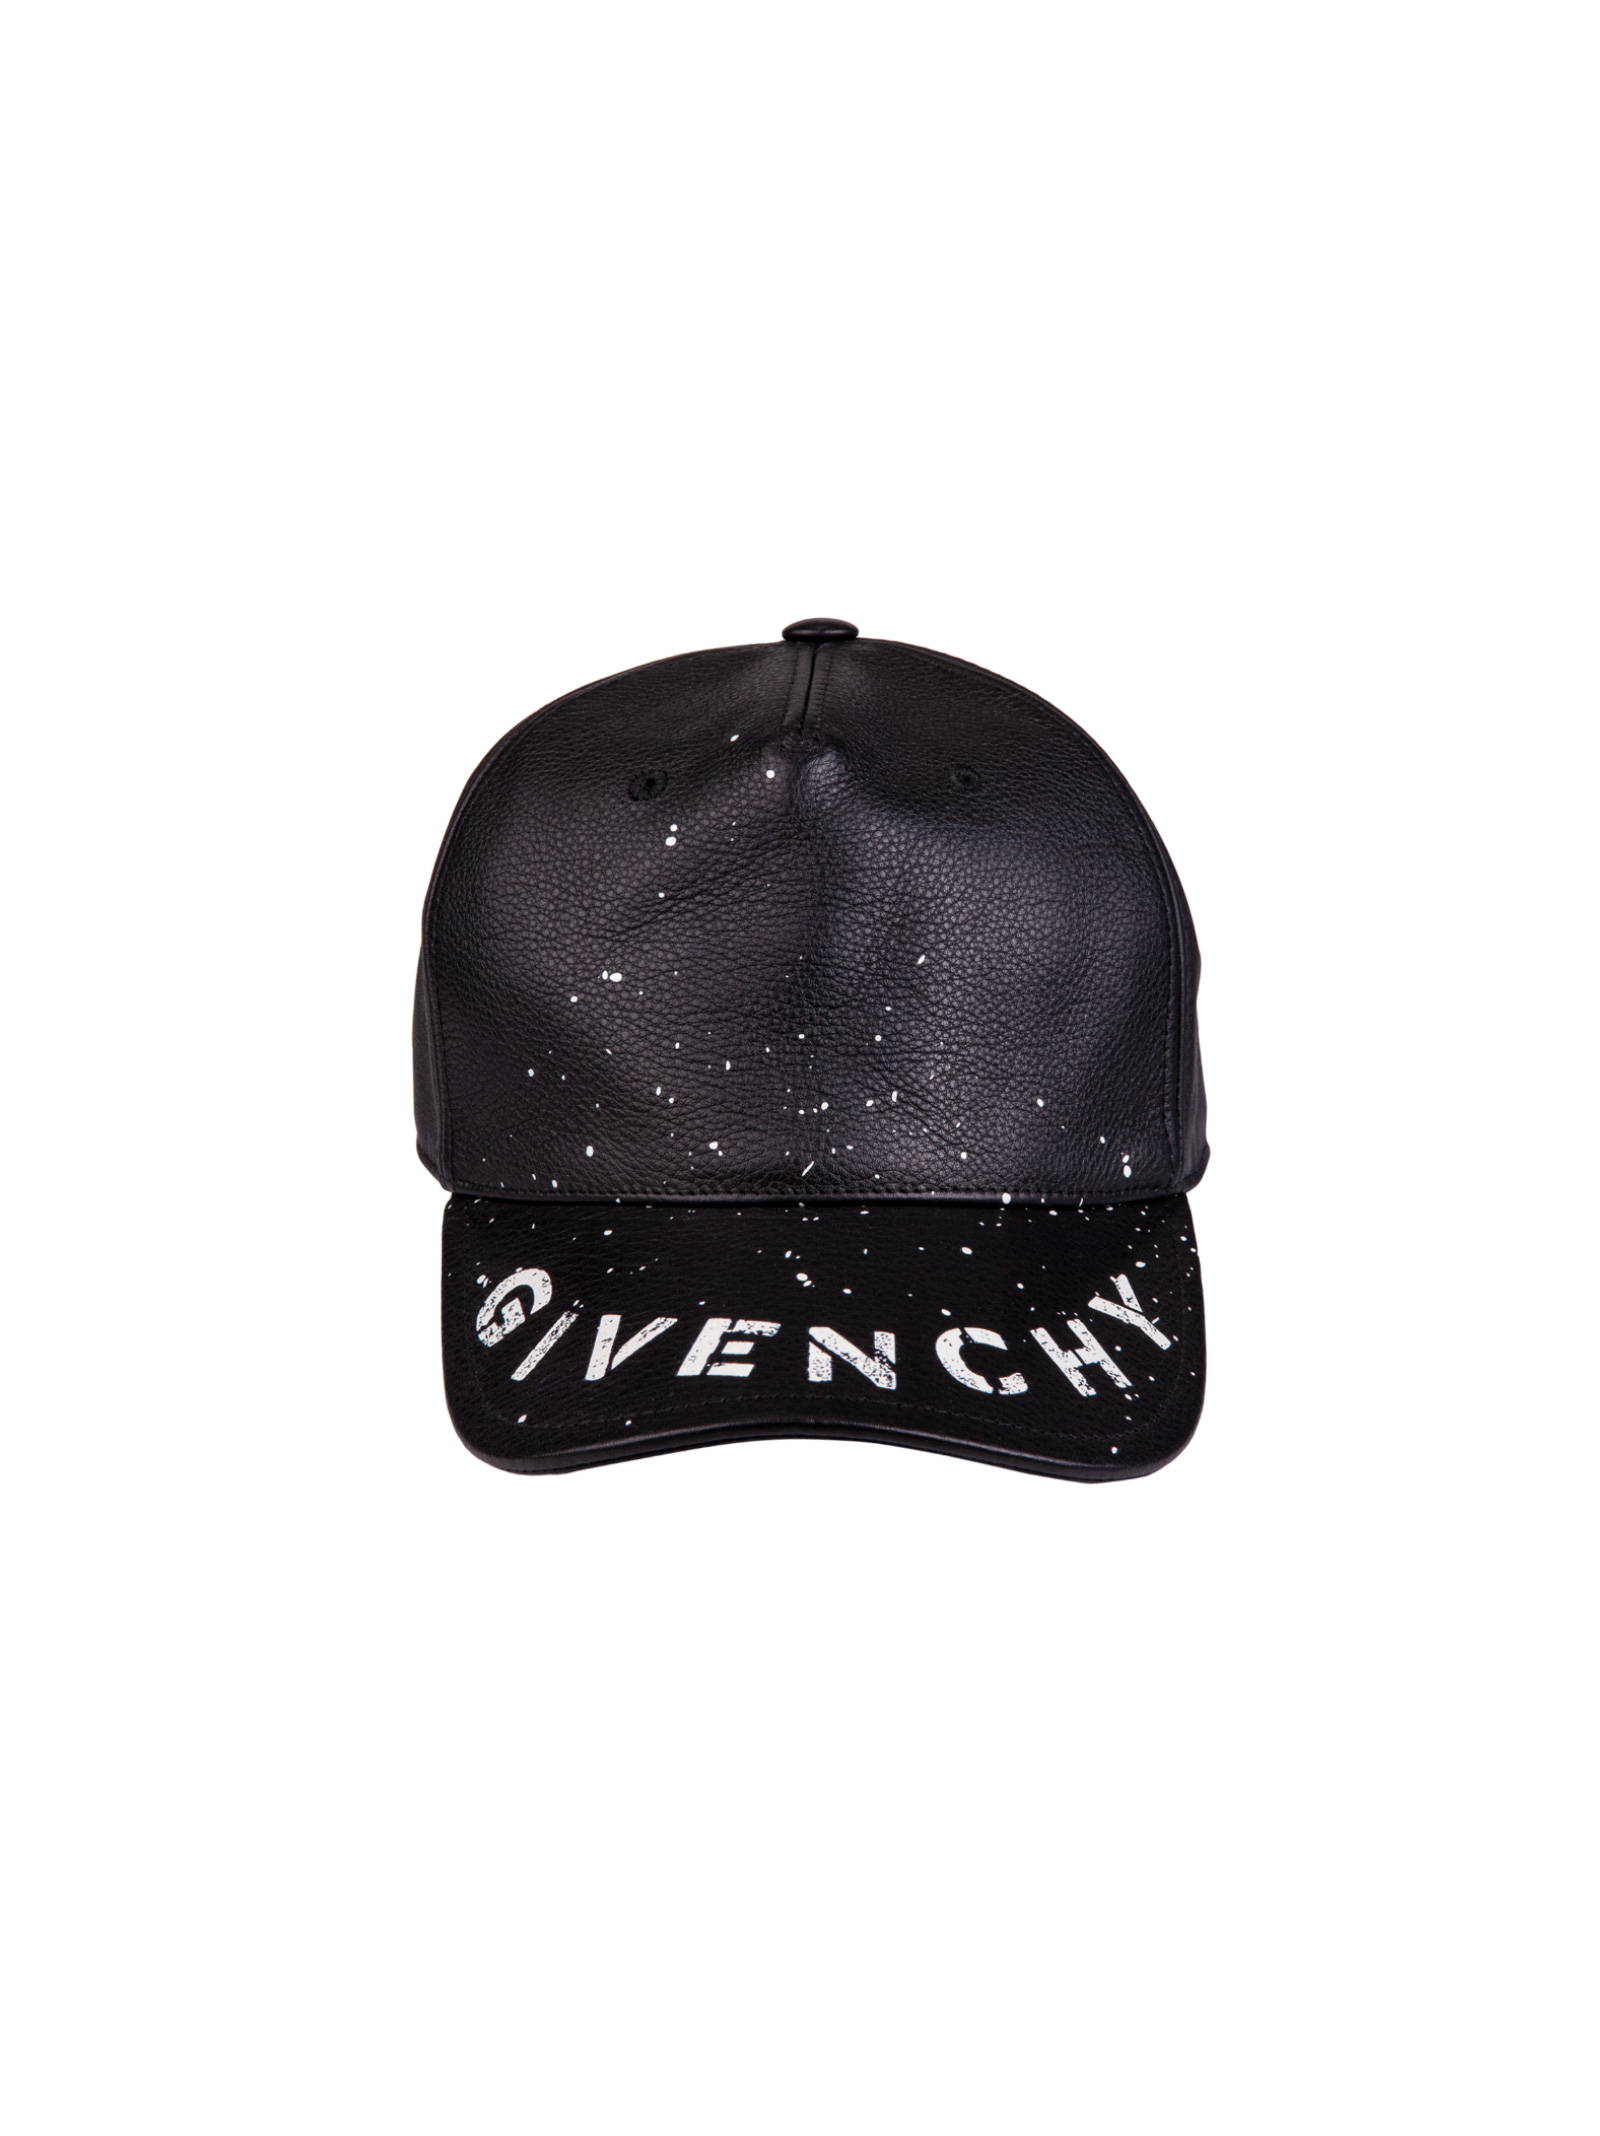 Cappello Givenchy - Givenchy - Michele Franzese Moda 02512a0286c5